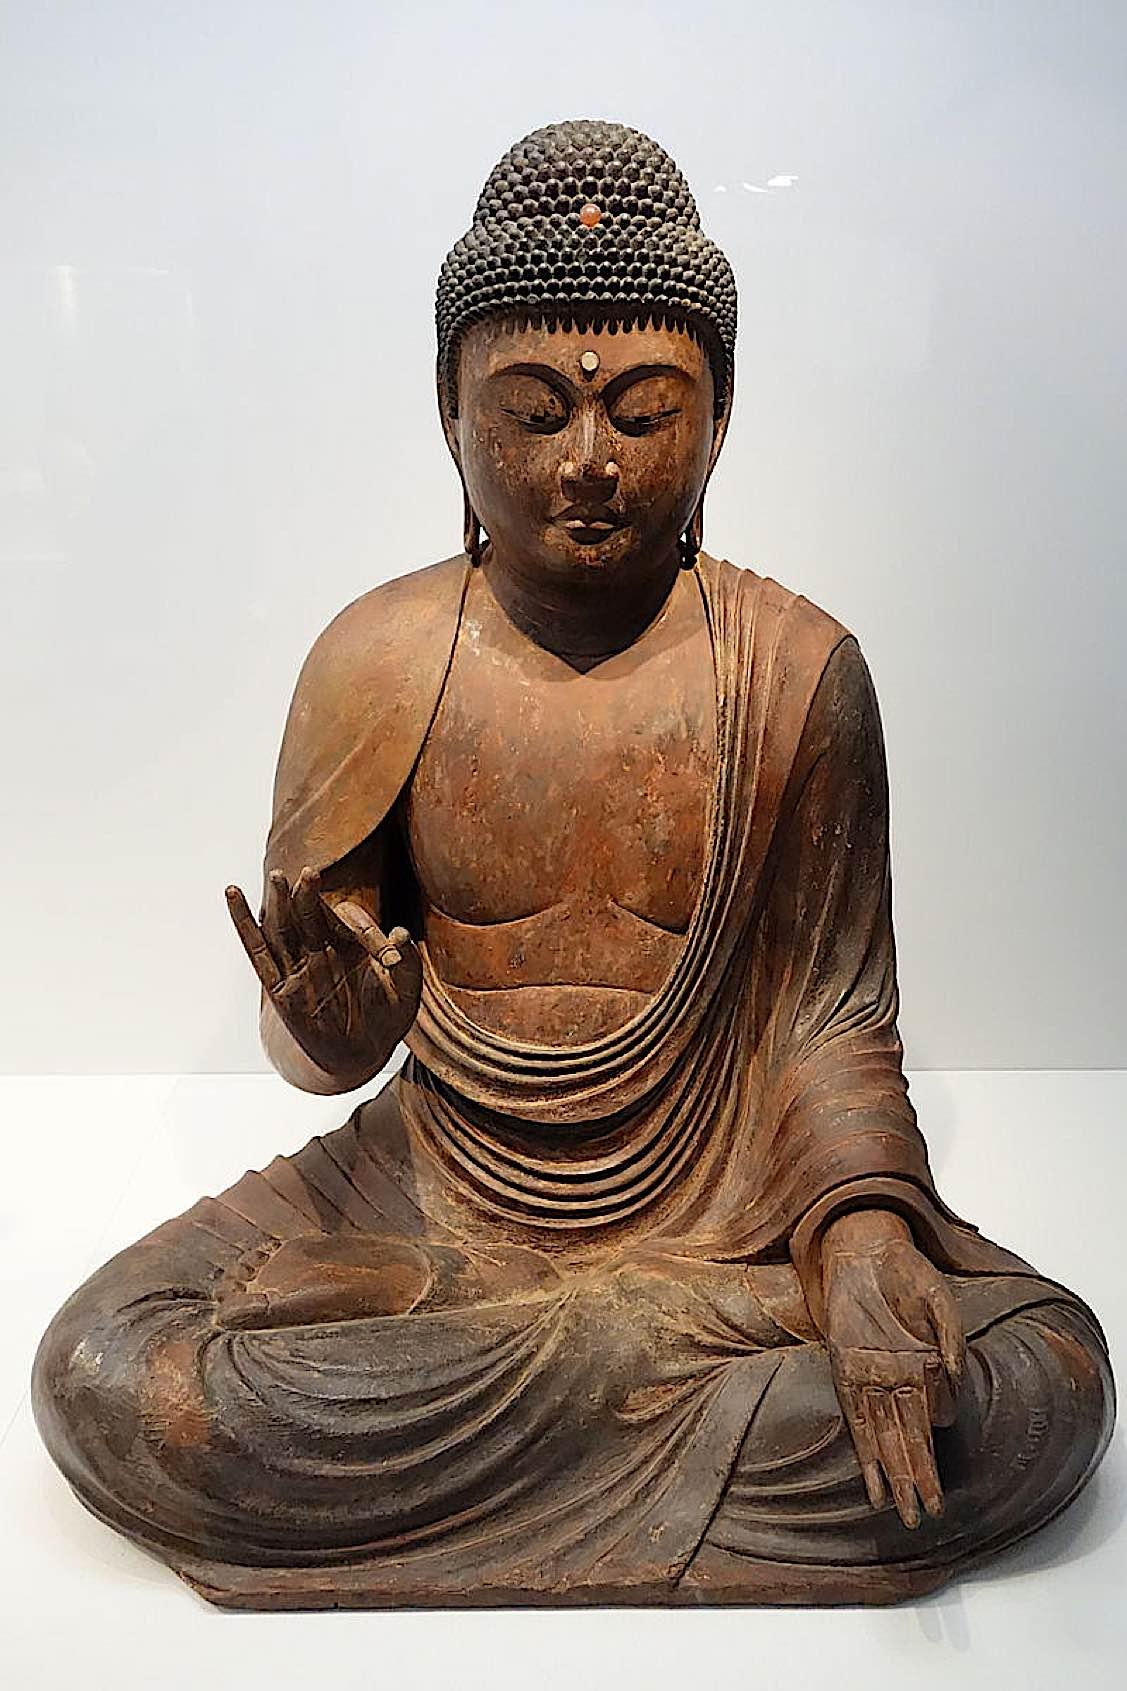 Buddha Weekly Seated Amida Nyorai Amitabha Kamakura period 12th 13th century wood with gold leaf and inlaid crystal eyes Tokyo National Museum DSC05345 Buddhism